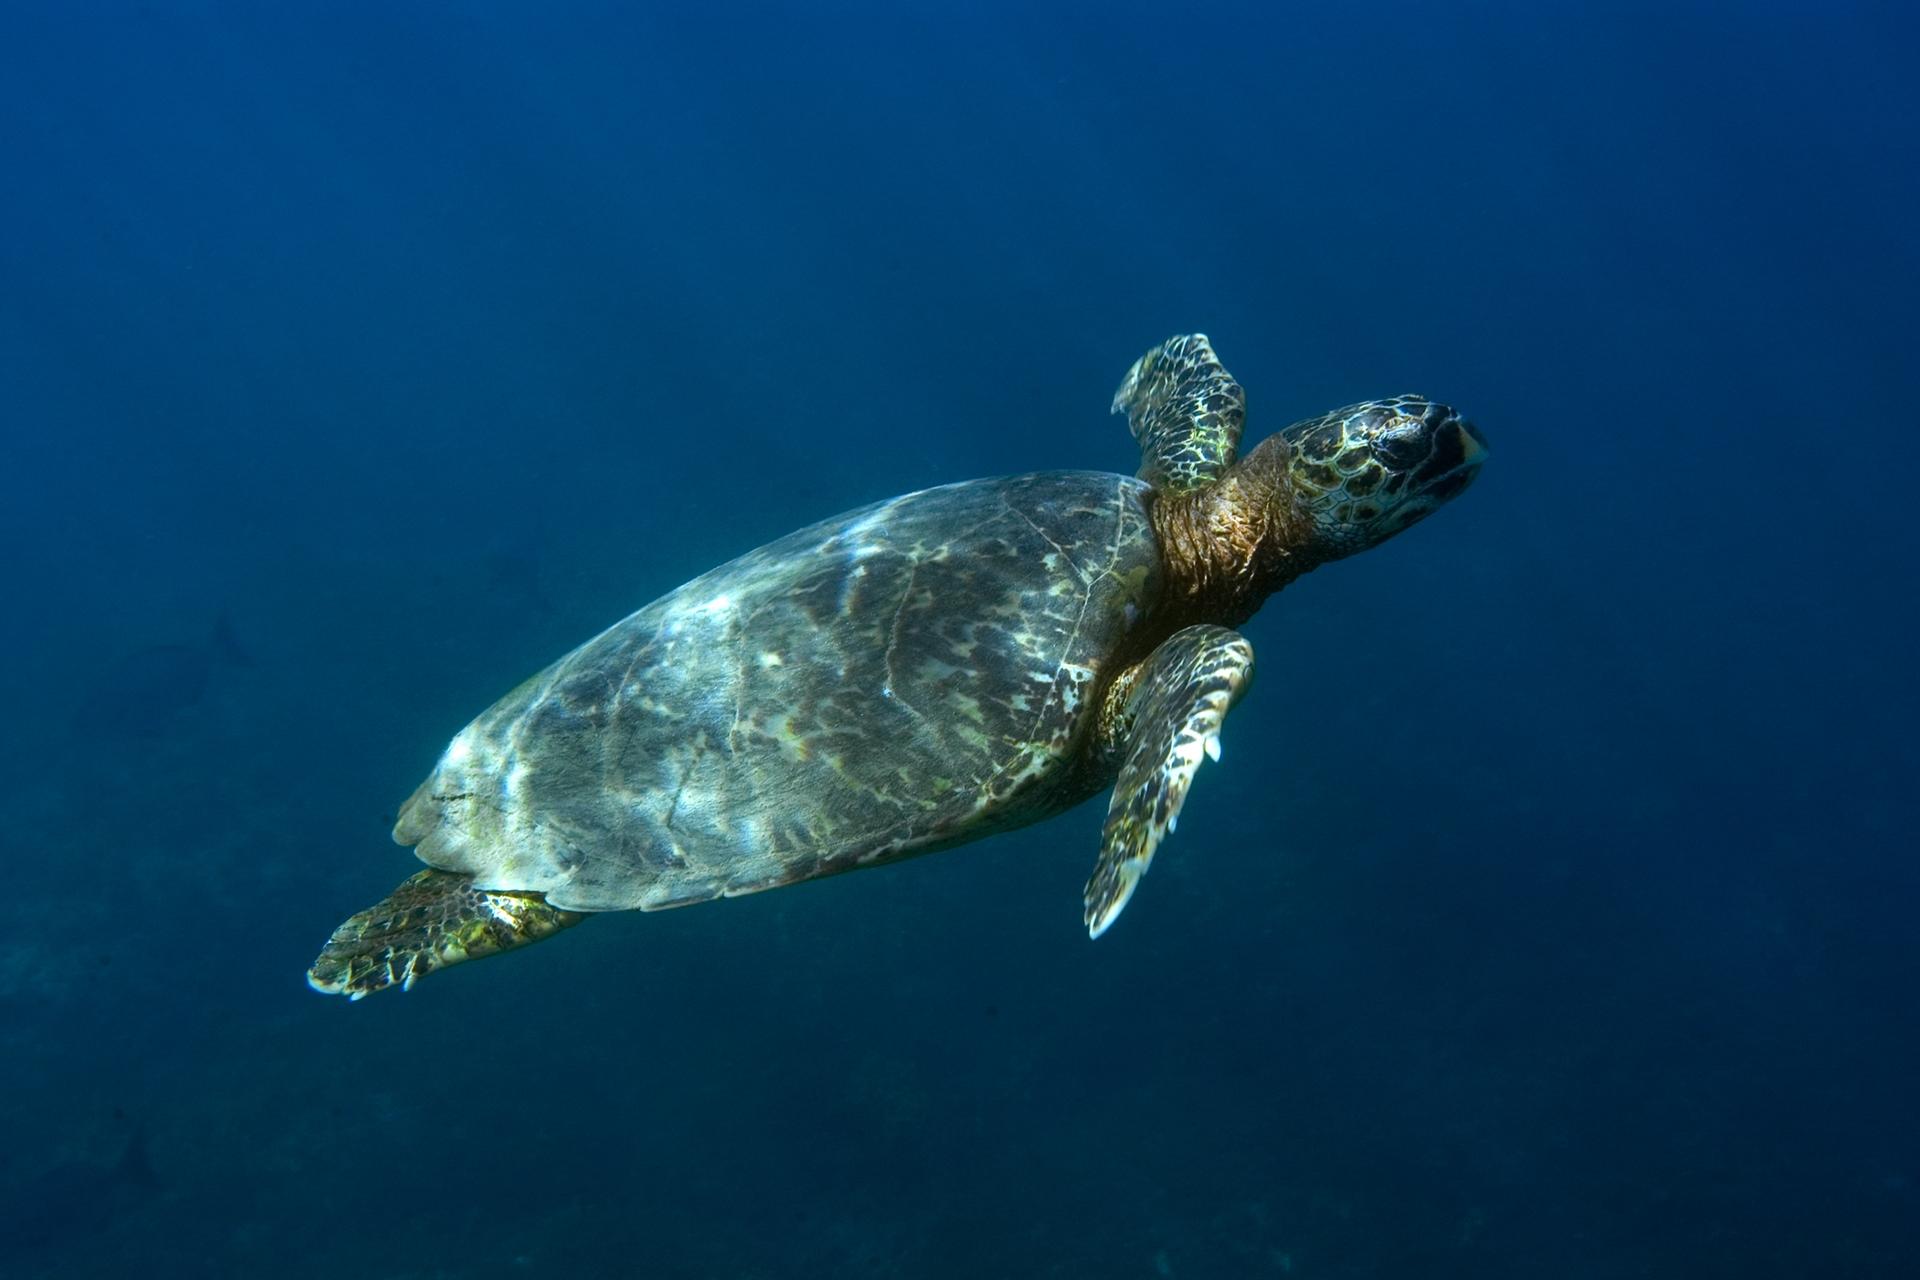 multi-image composition deep sea turtle